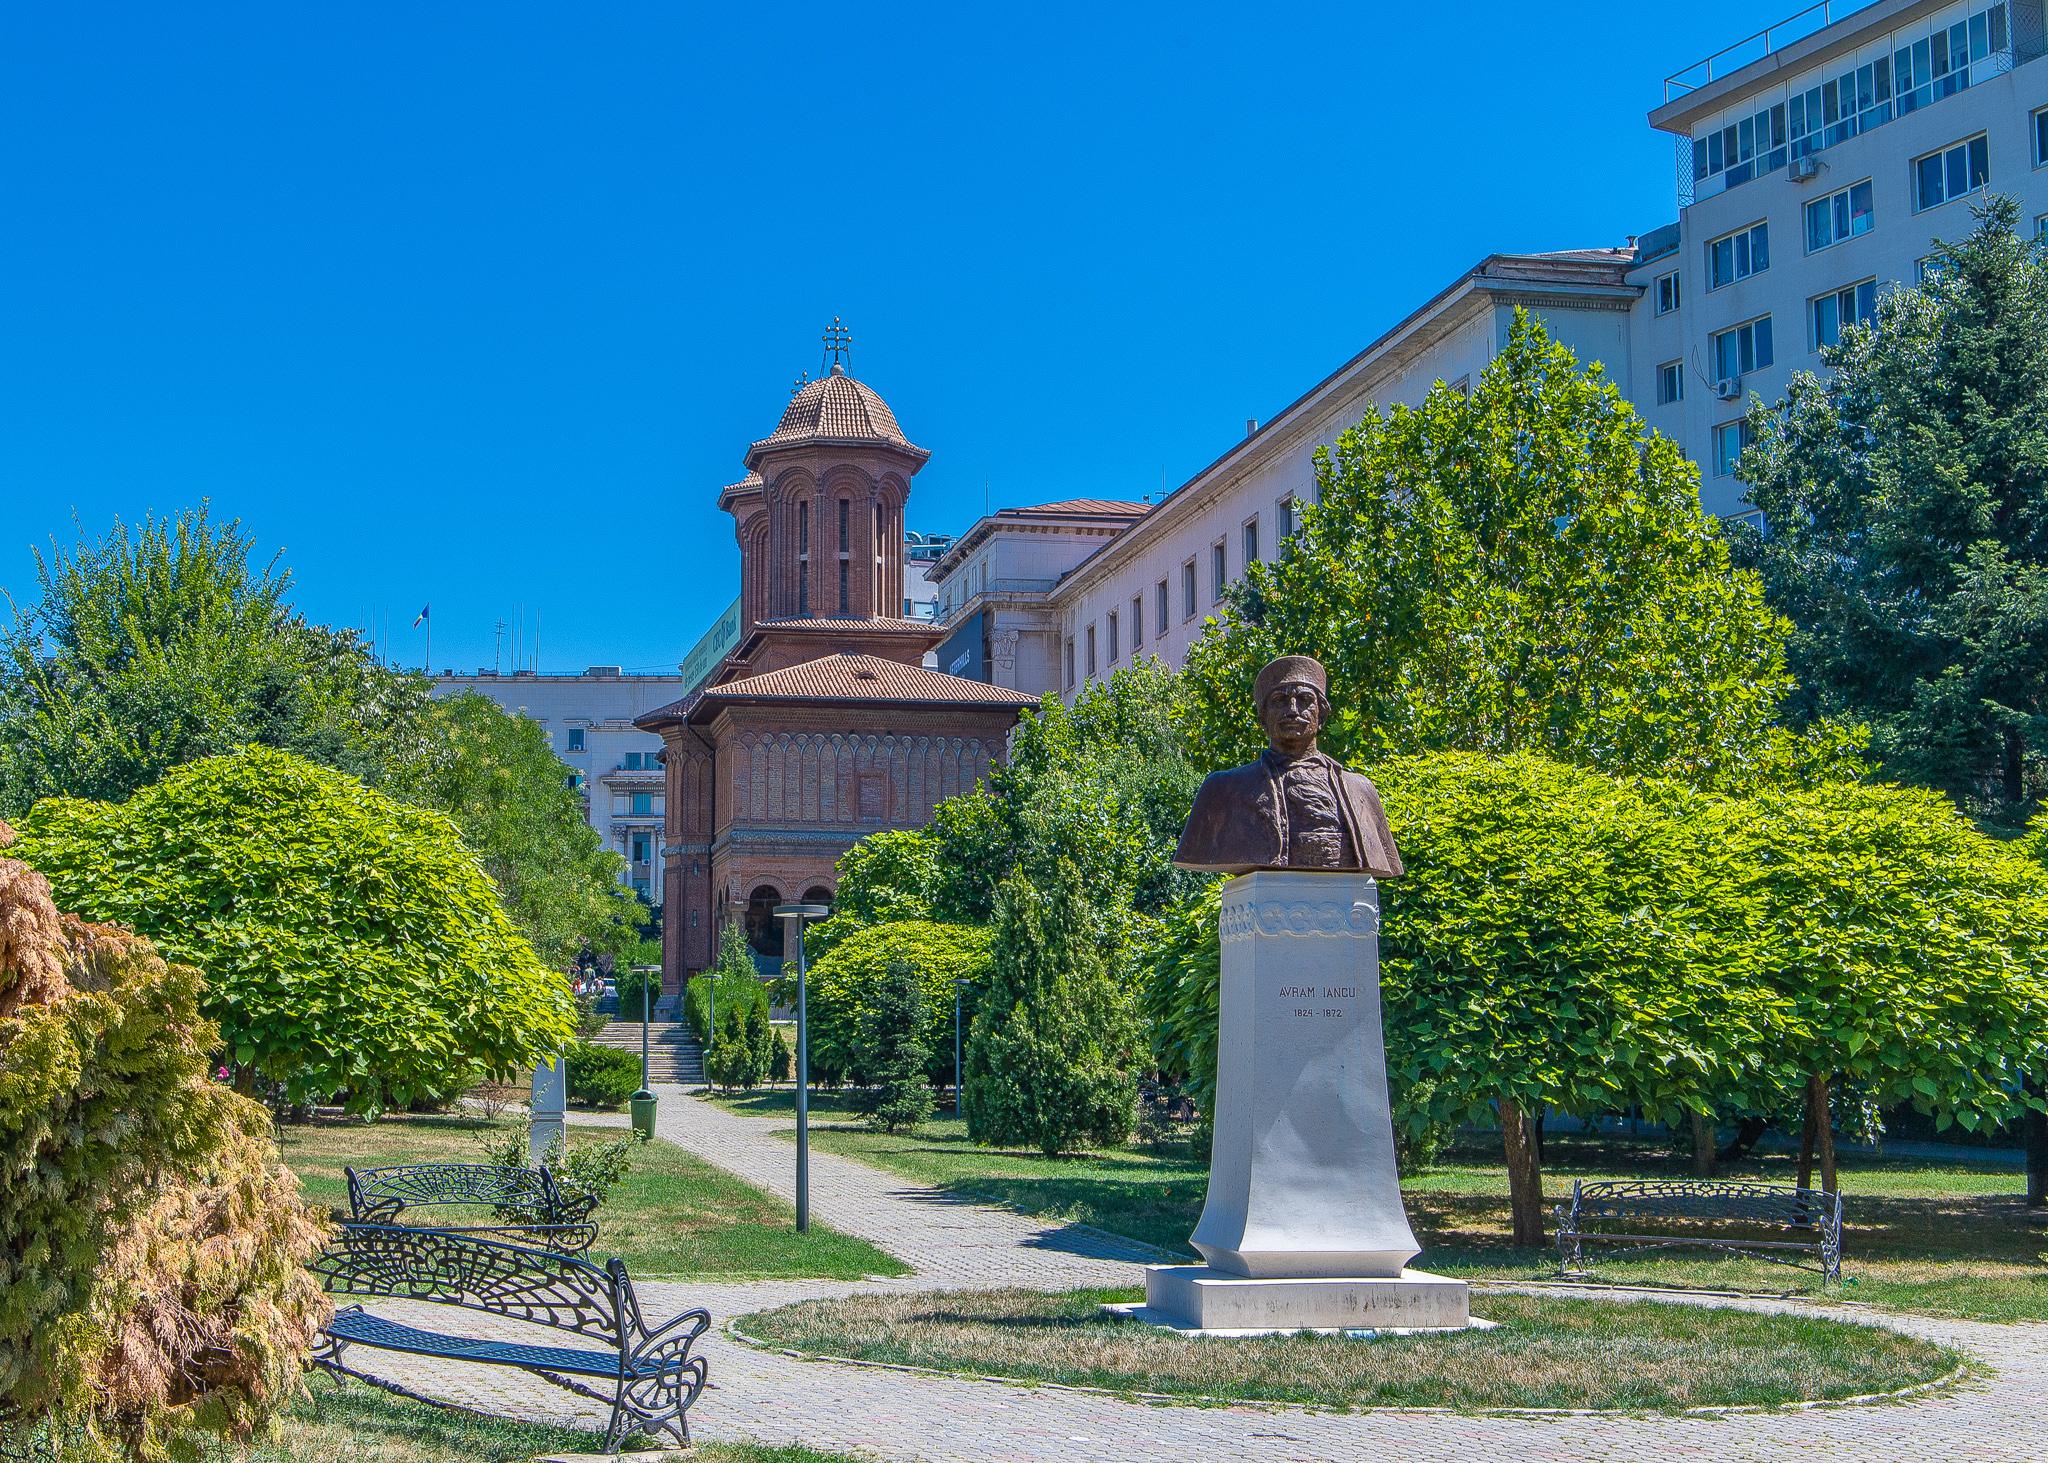 Statue of lawyer and miltiary hero Avram Iancu in front of the Kretzulescu Church